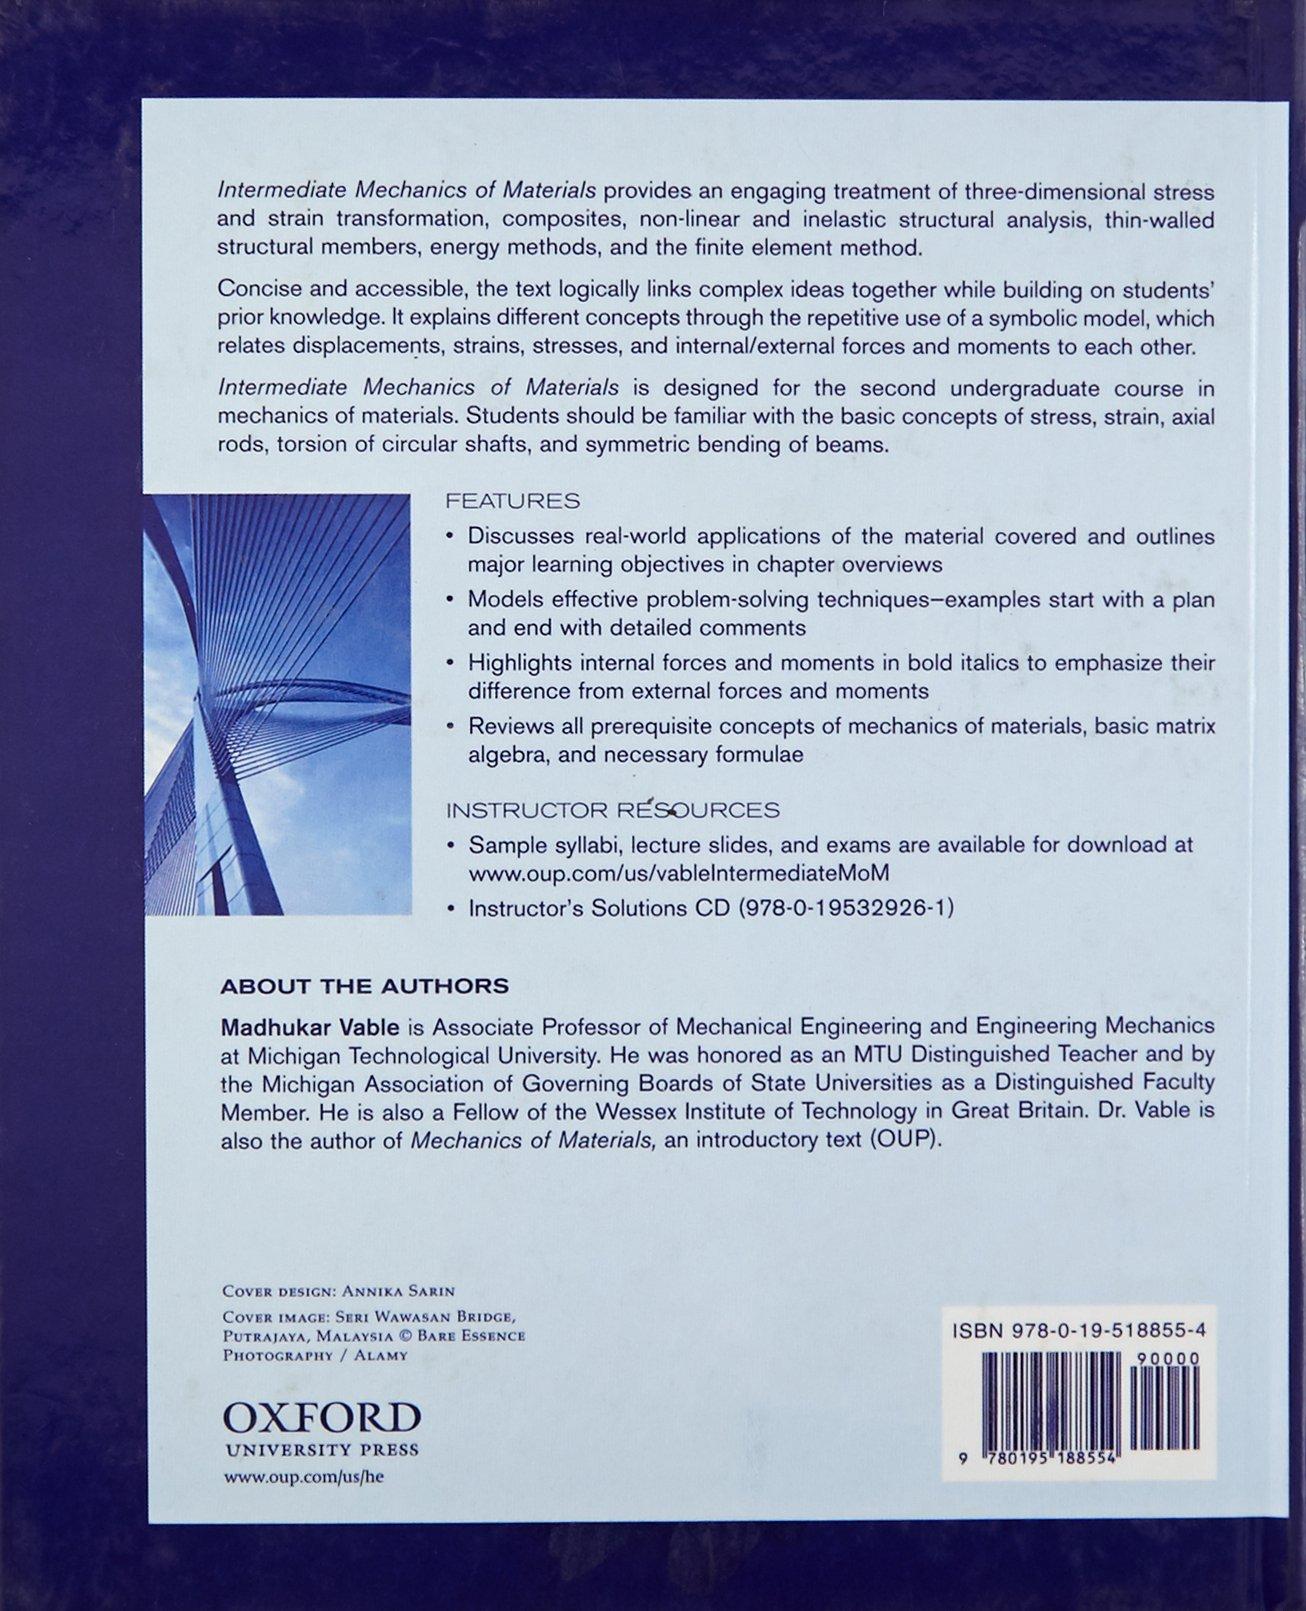 Intermediate Mechanics of Materials: Madhukar Vable: 9780195188554: Books -  Amazon.ca